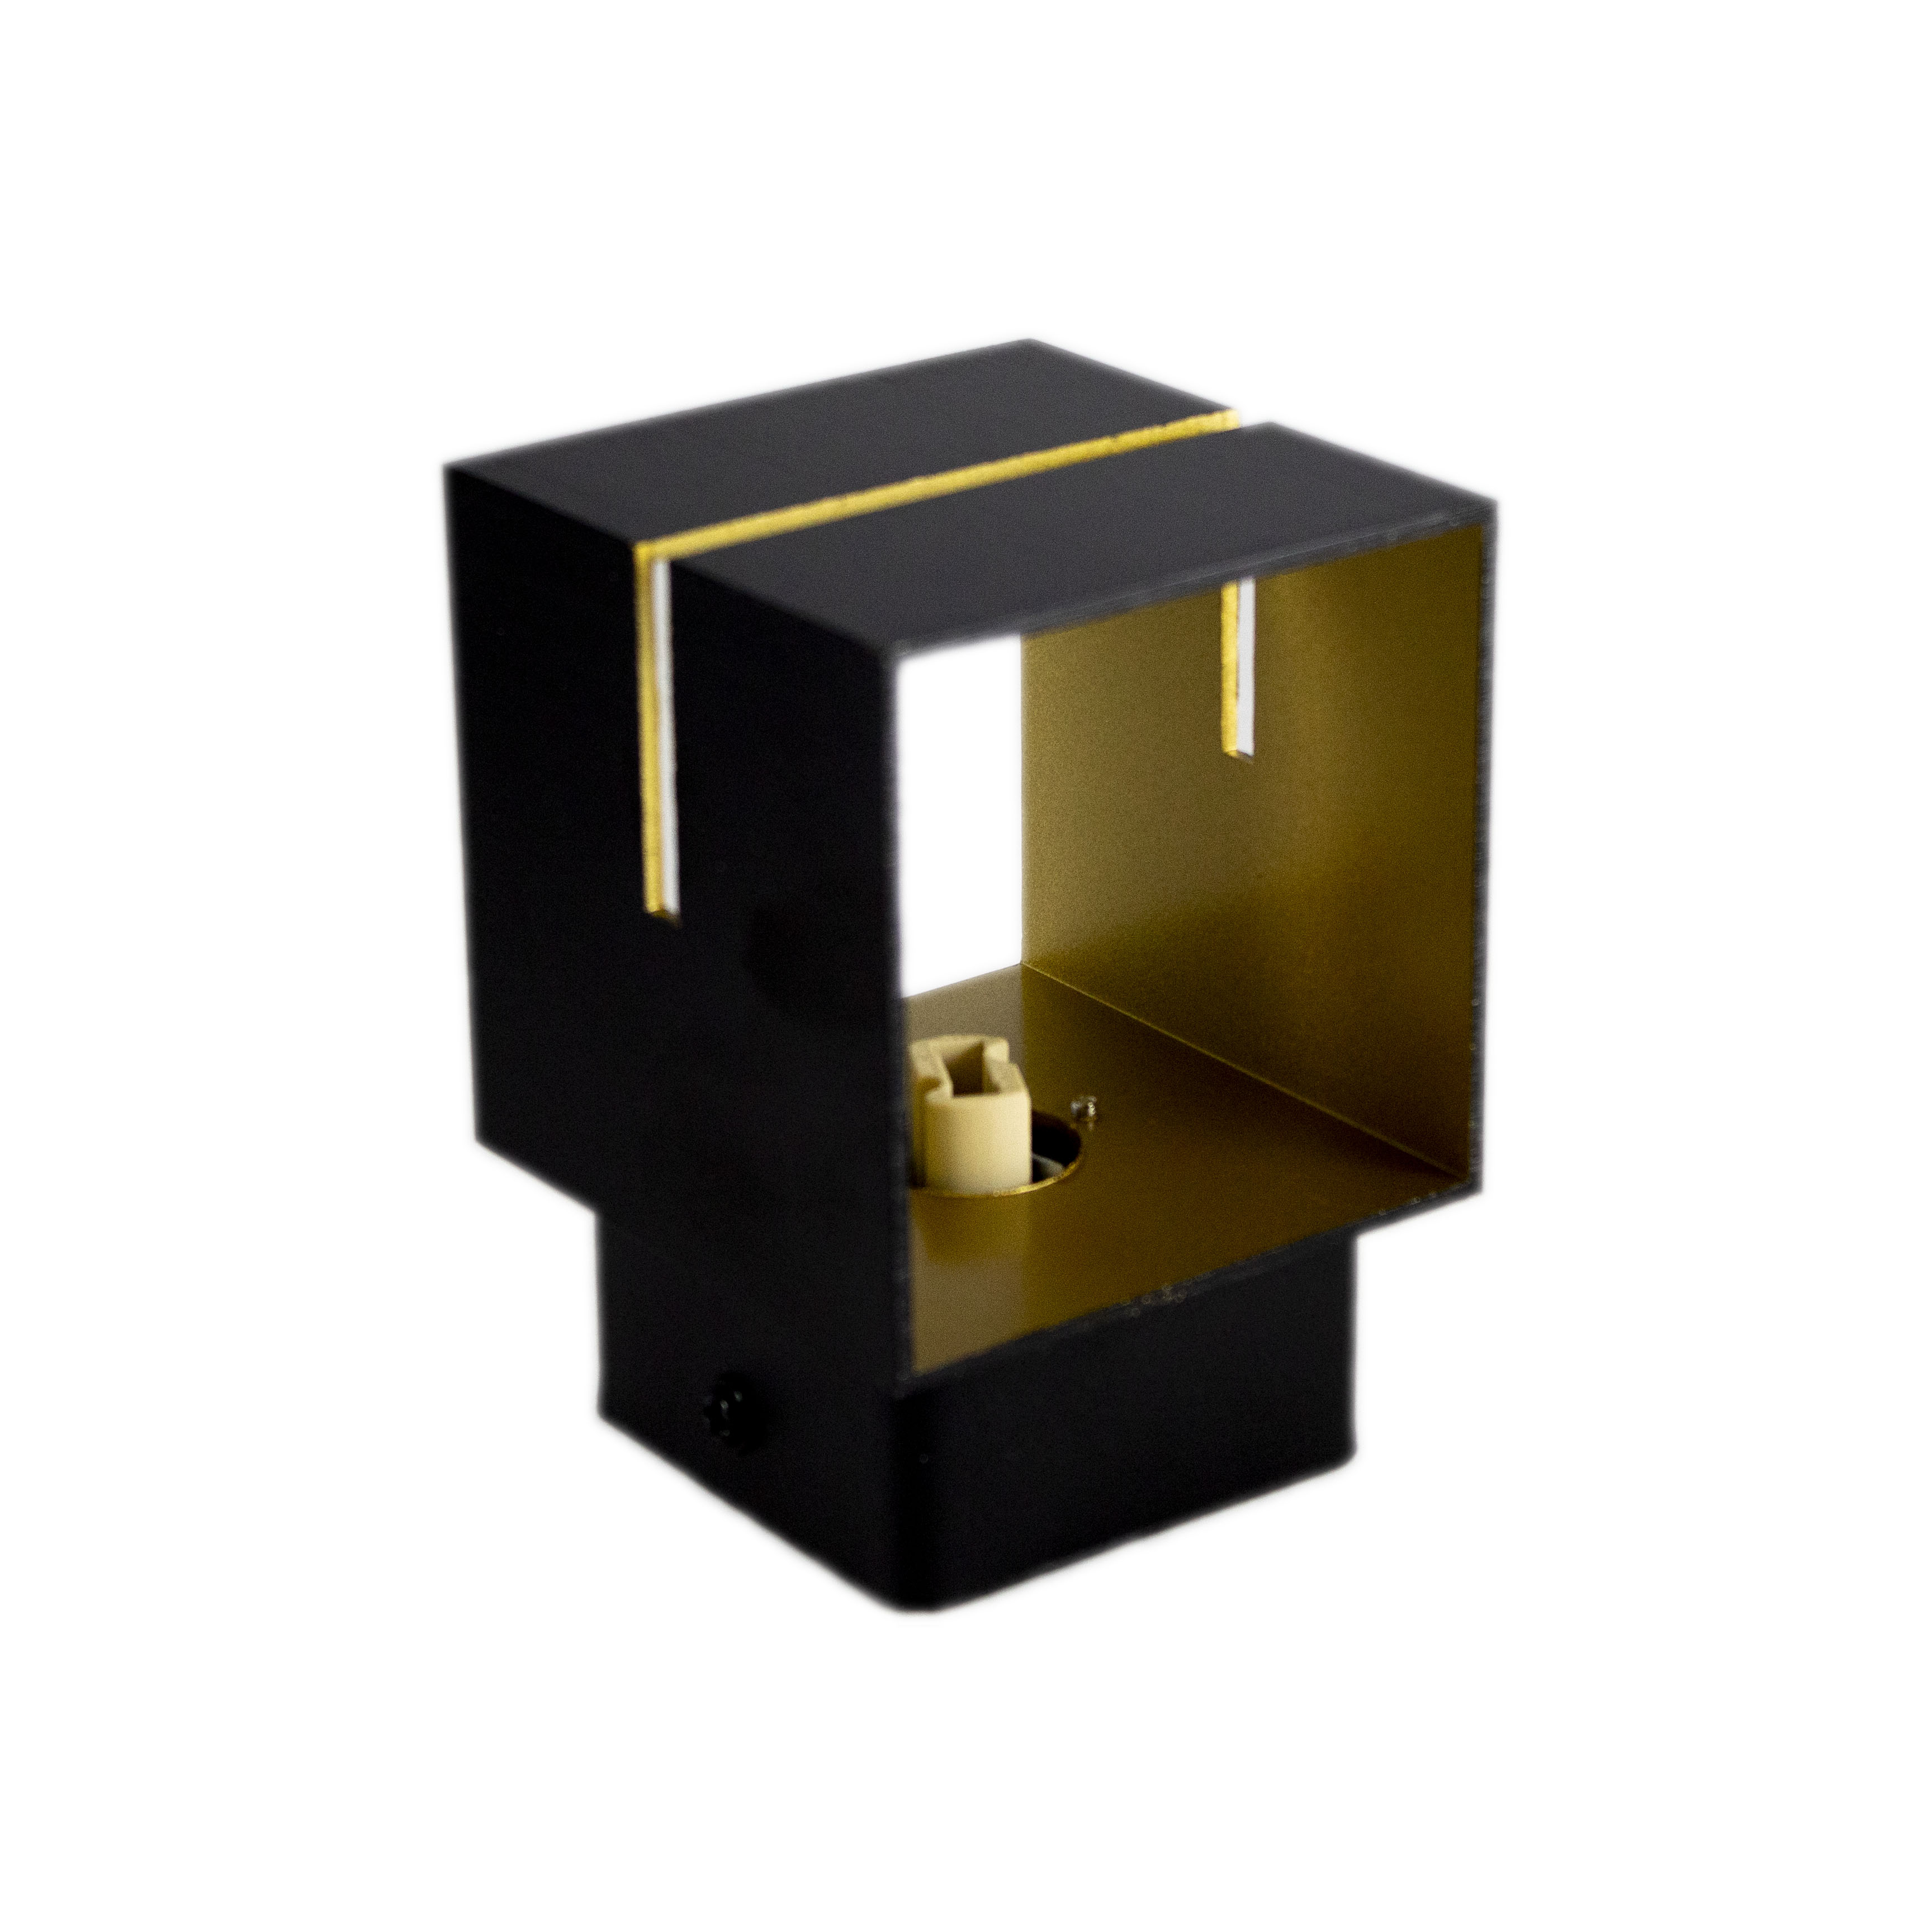 Led wandlamp vierkant zwart goud 2 keer G9 fitting - ip20 - lamp staand